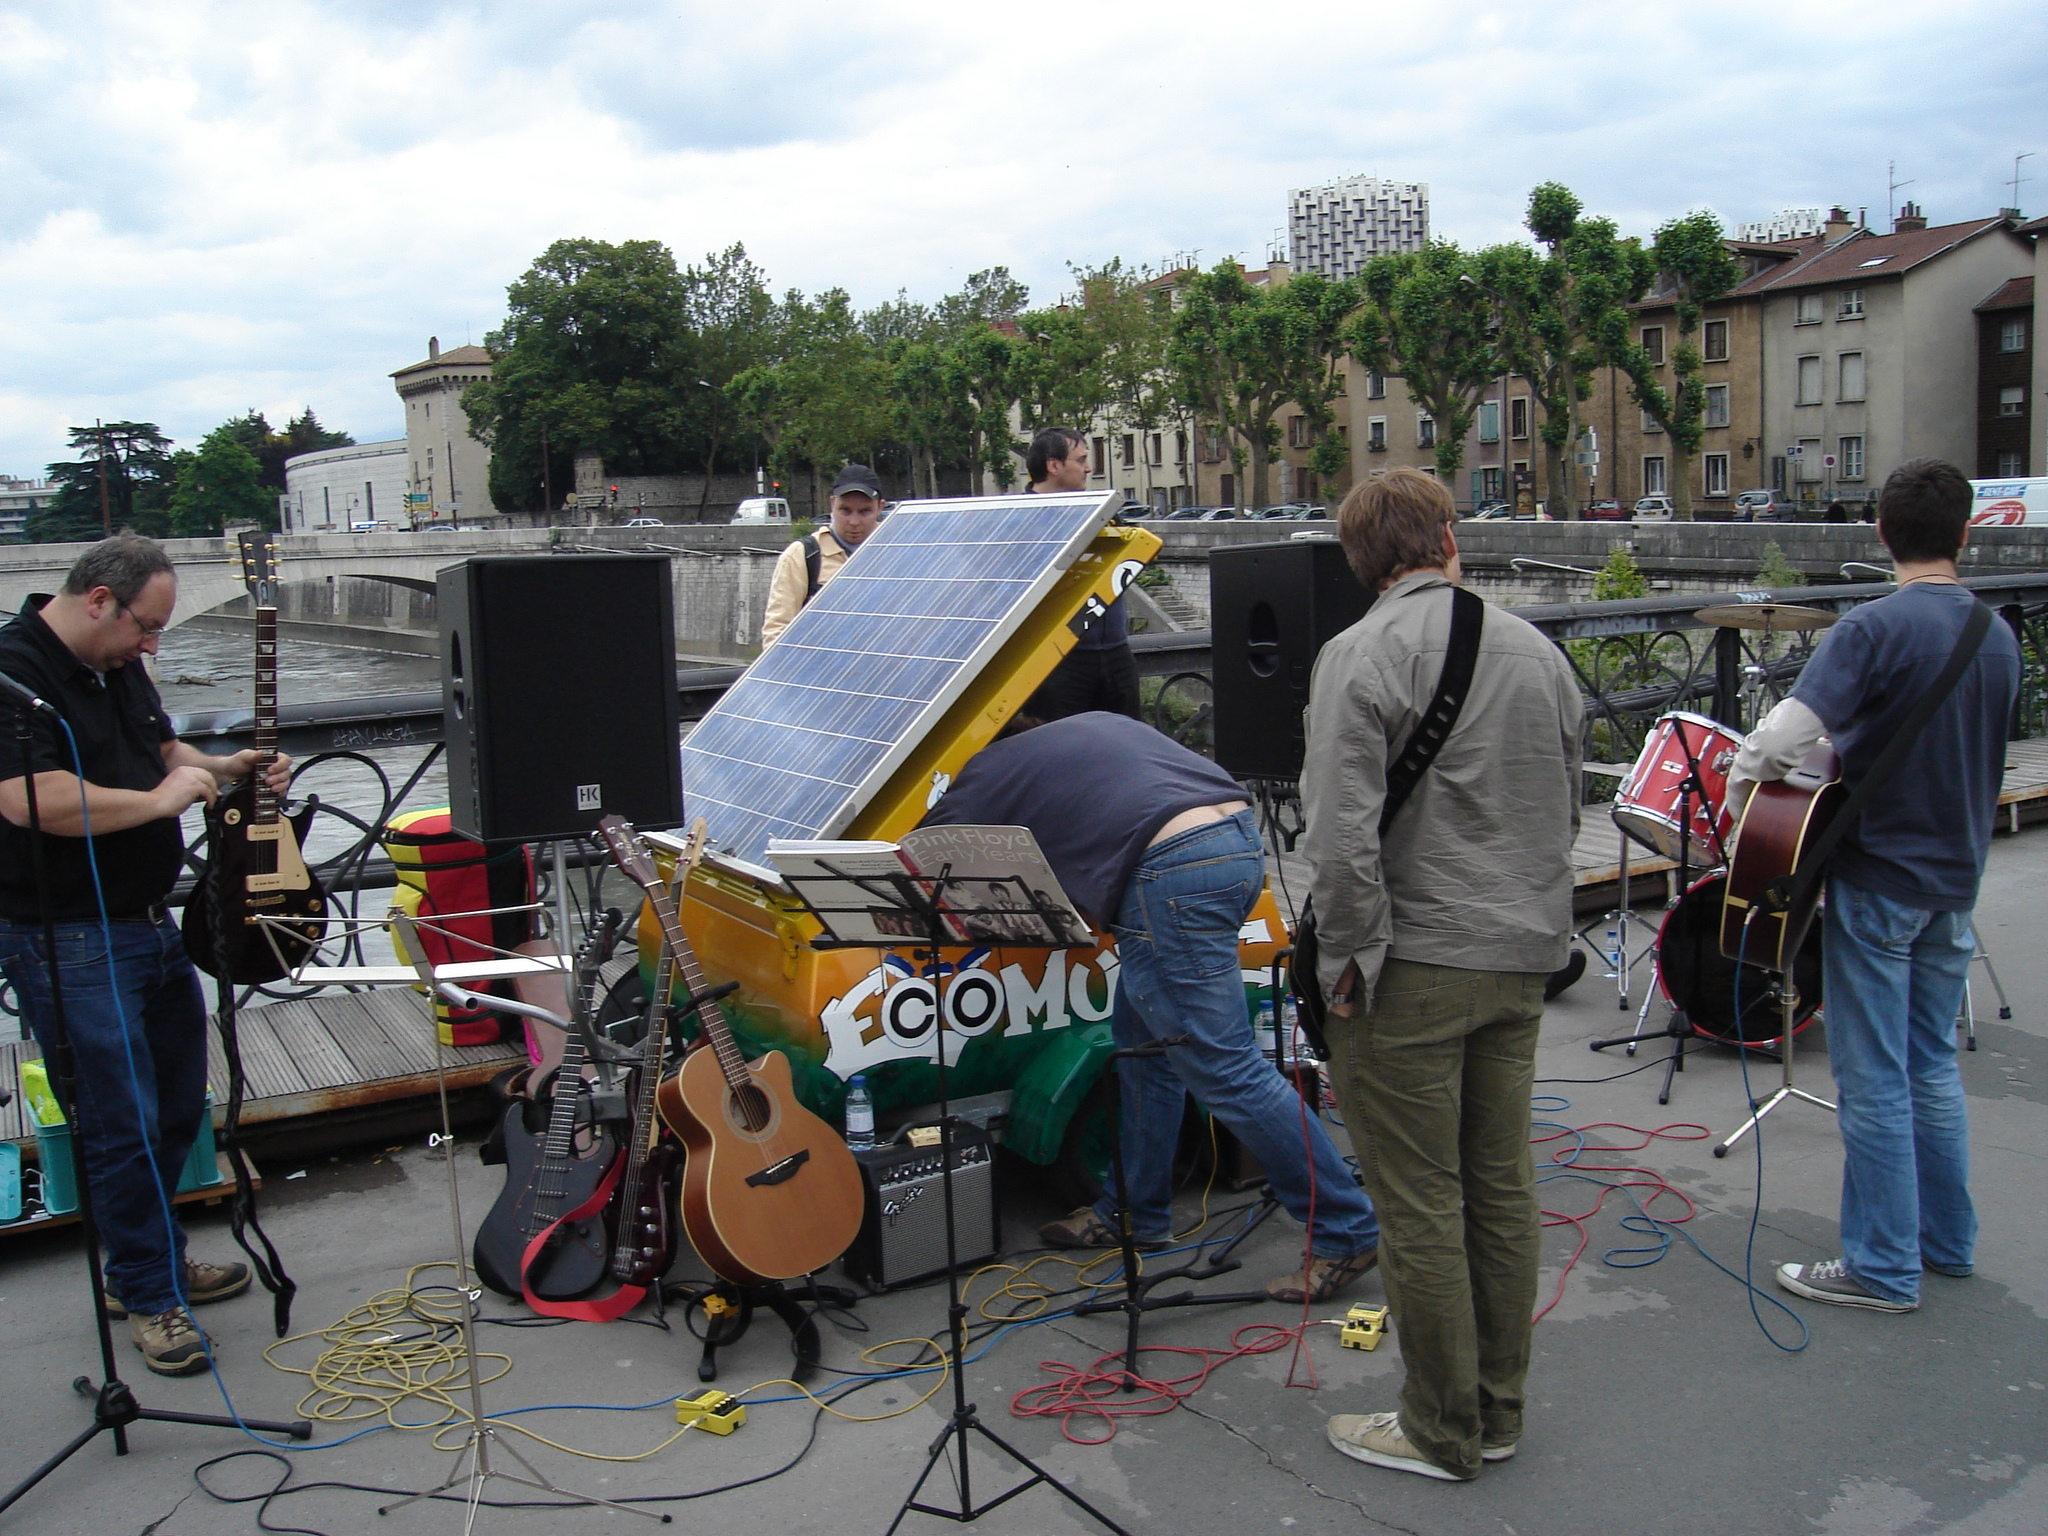 grenoble_scene_solaire_21-06-2010_044